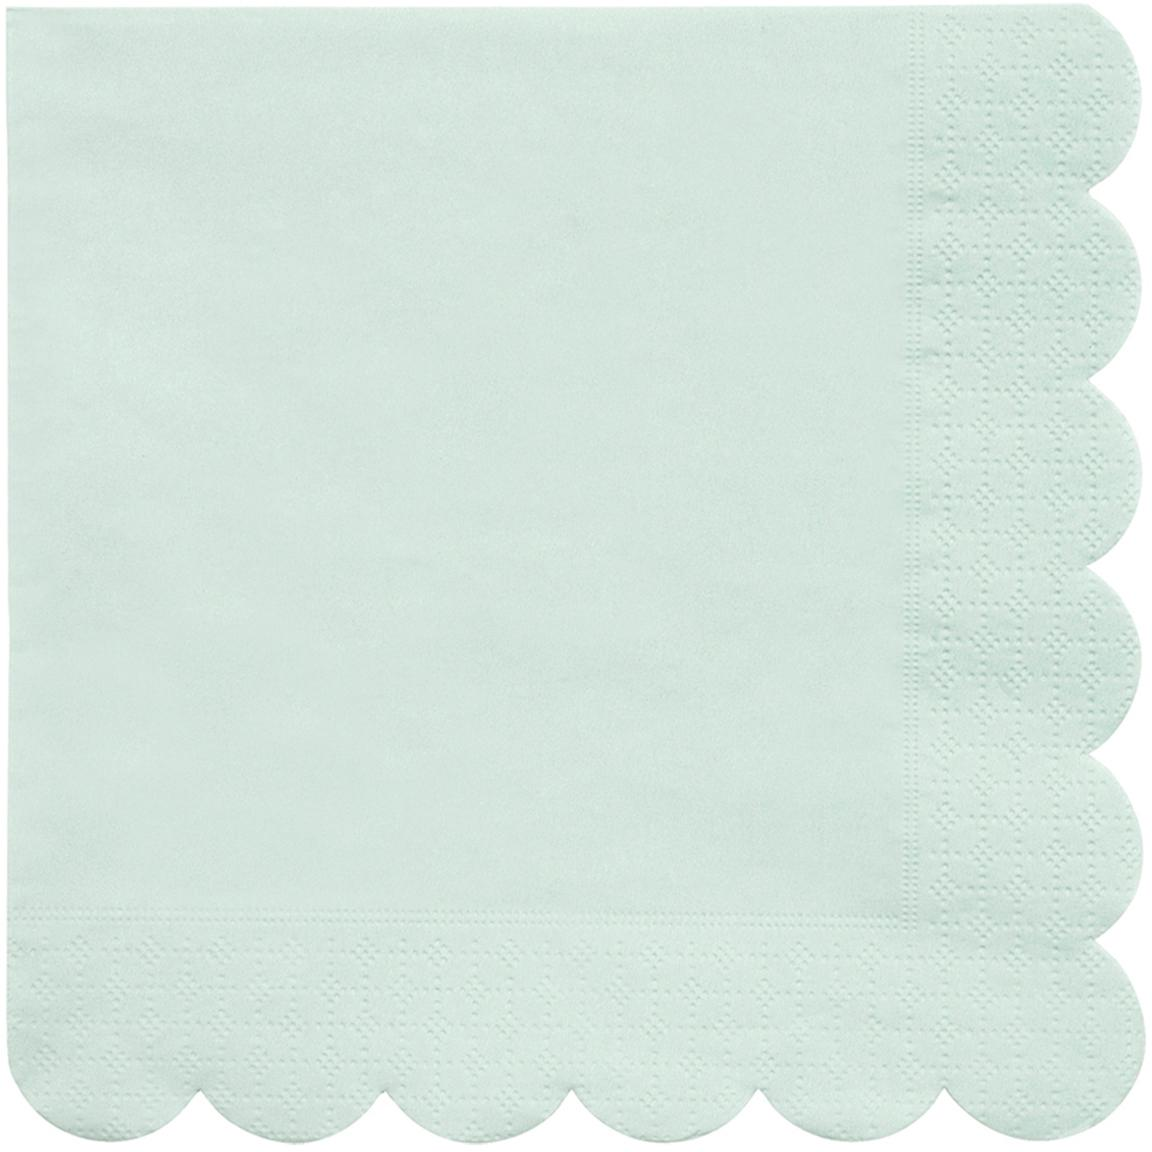 Papieren servetten Simply Eco, 20 stuks, Papier, Mintgroen, 33 x 33 cm